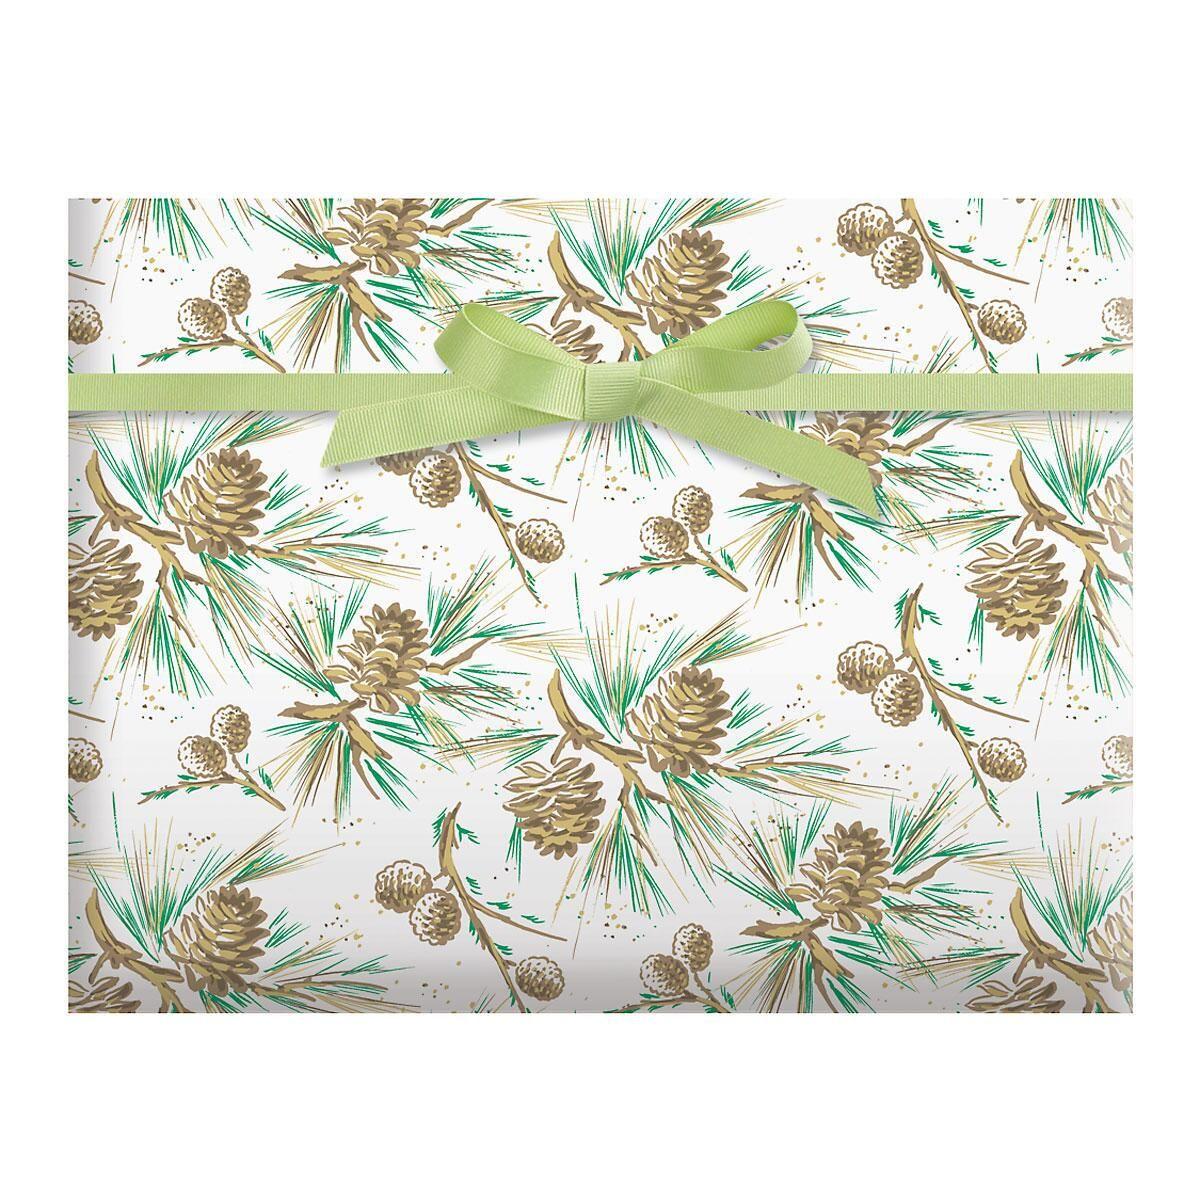 Pinecones on White Jumbo Rolled Gift Wrap